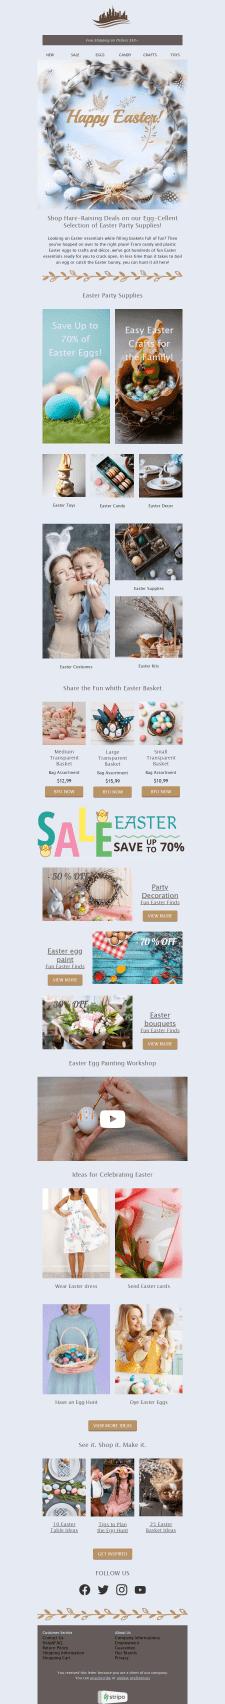 Шаблон Easter для Stripo